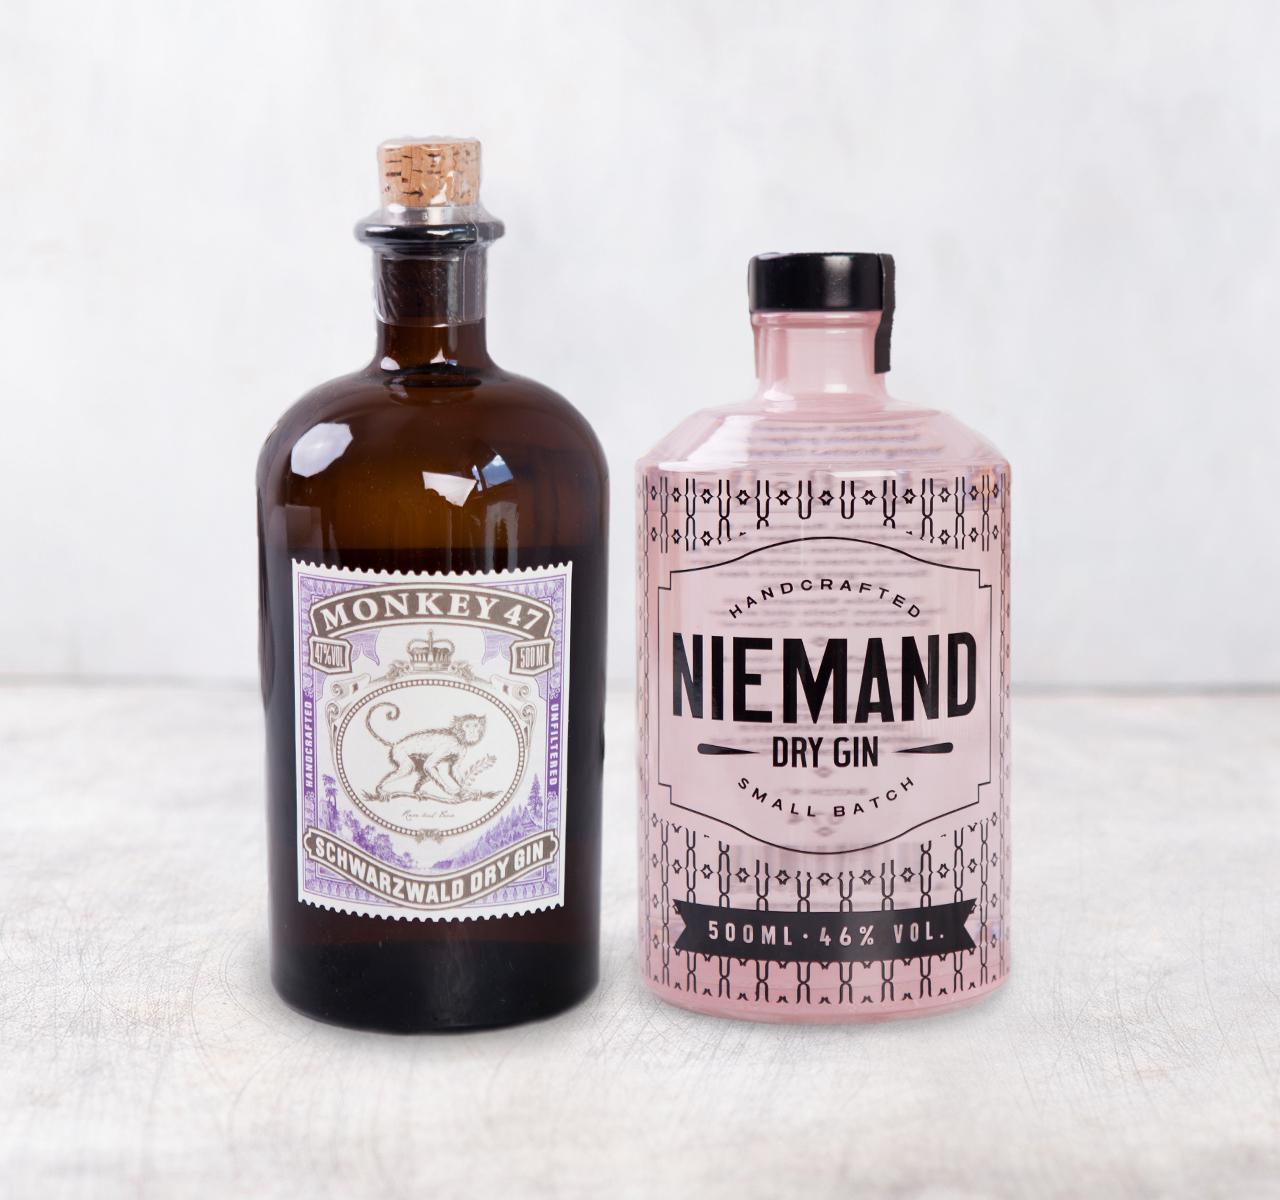 (Foodist] Monkey 47 & Niemand Dry Gin